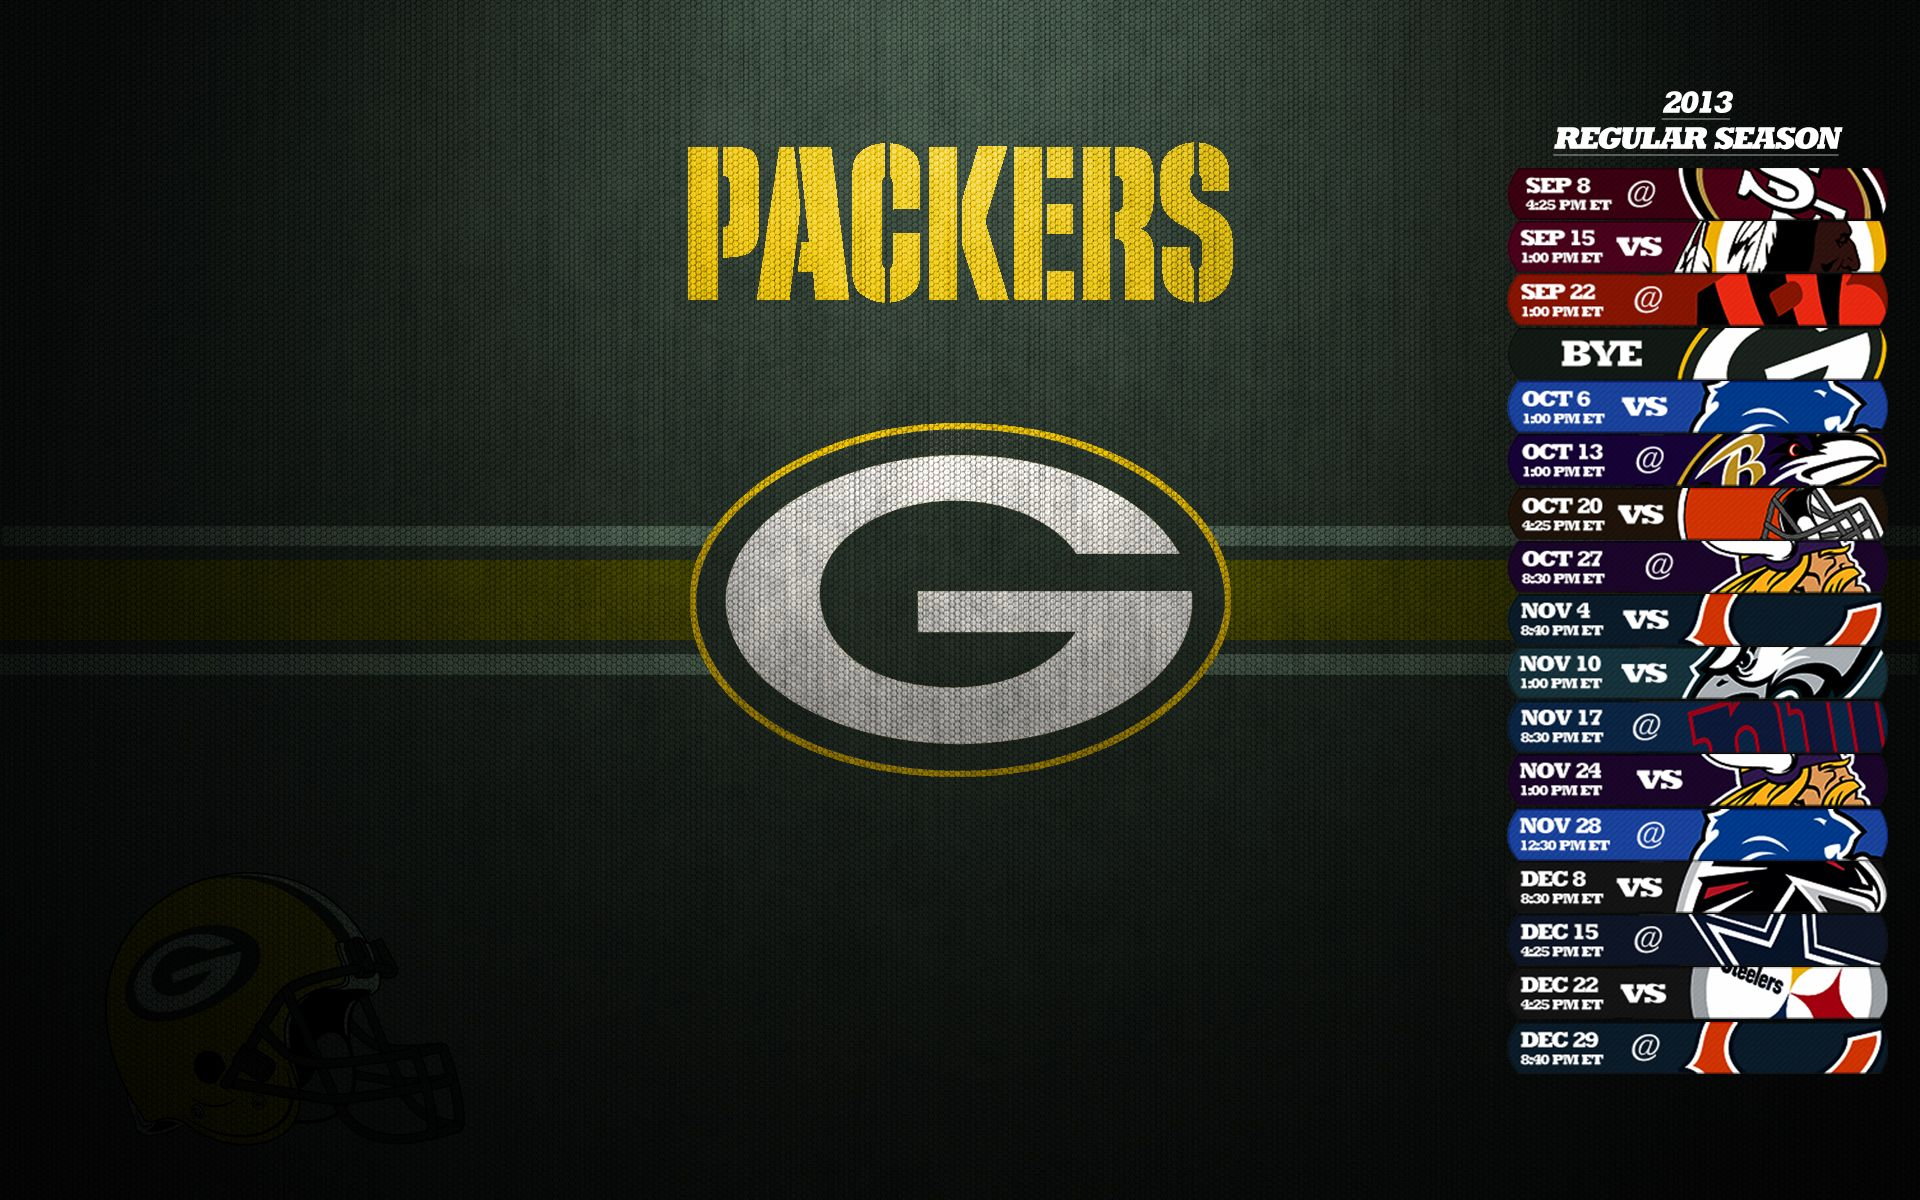 Green Bay Packers Schedule 2013 Wallpaper Green Bay Packers Packers Schedule Green Bay Packers Wallpaper